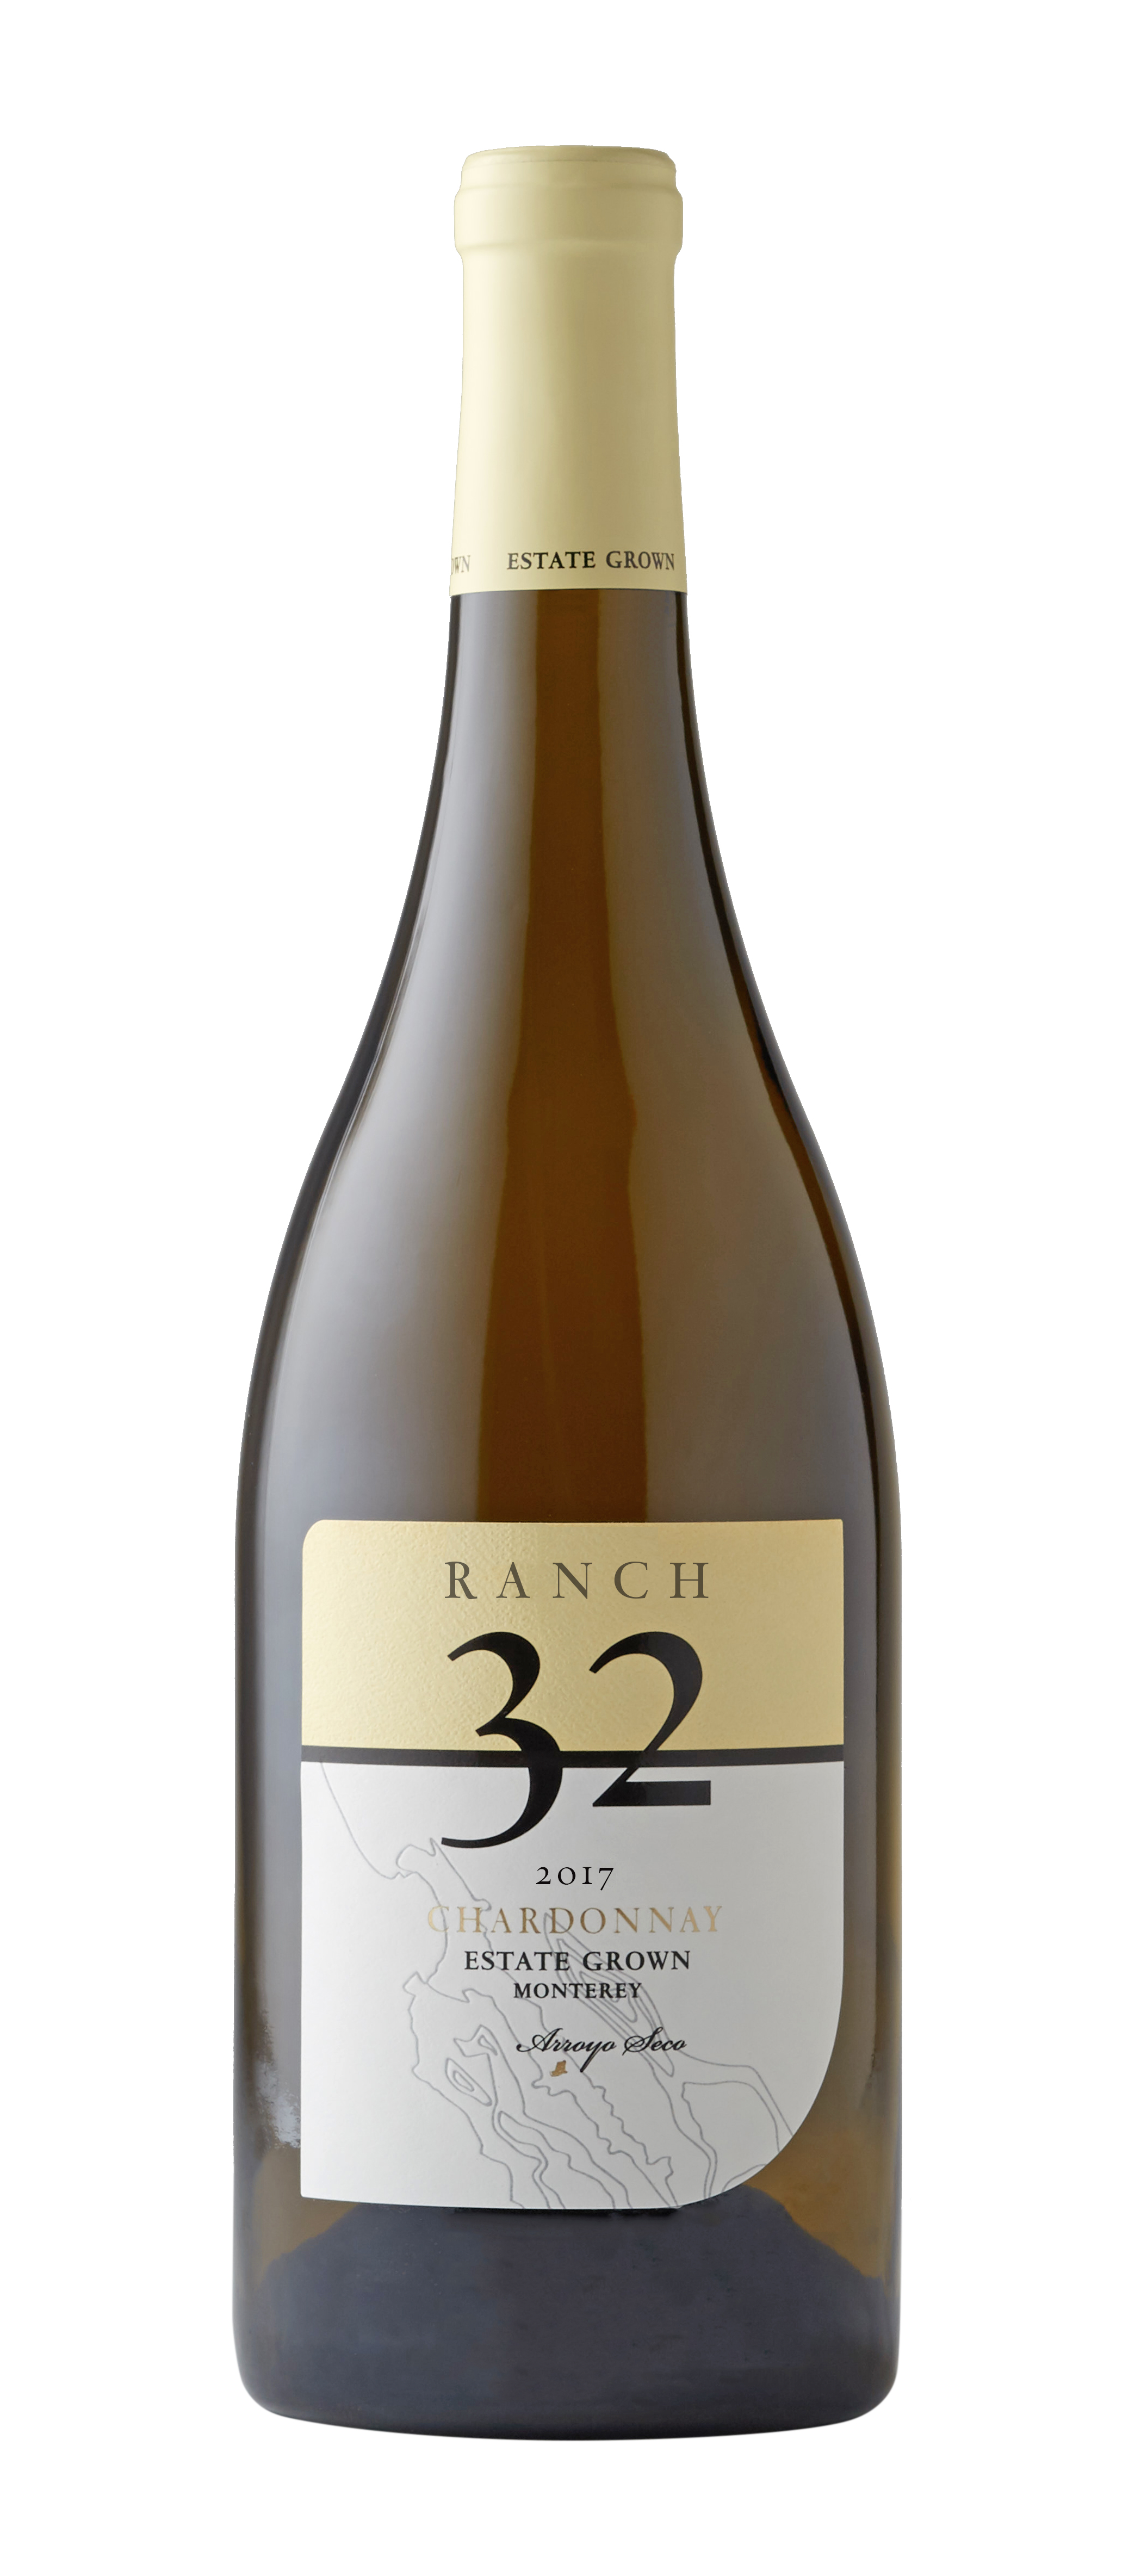 Scheid Ranch 32 Chardonnay